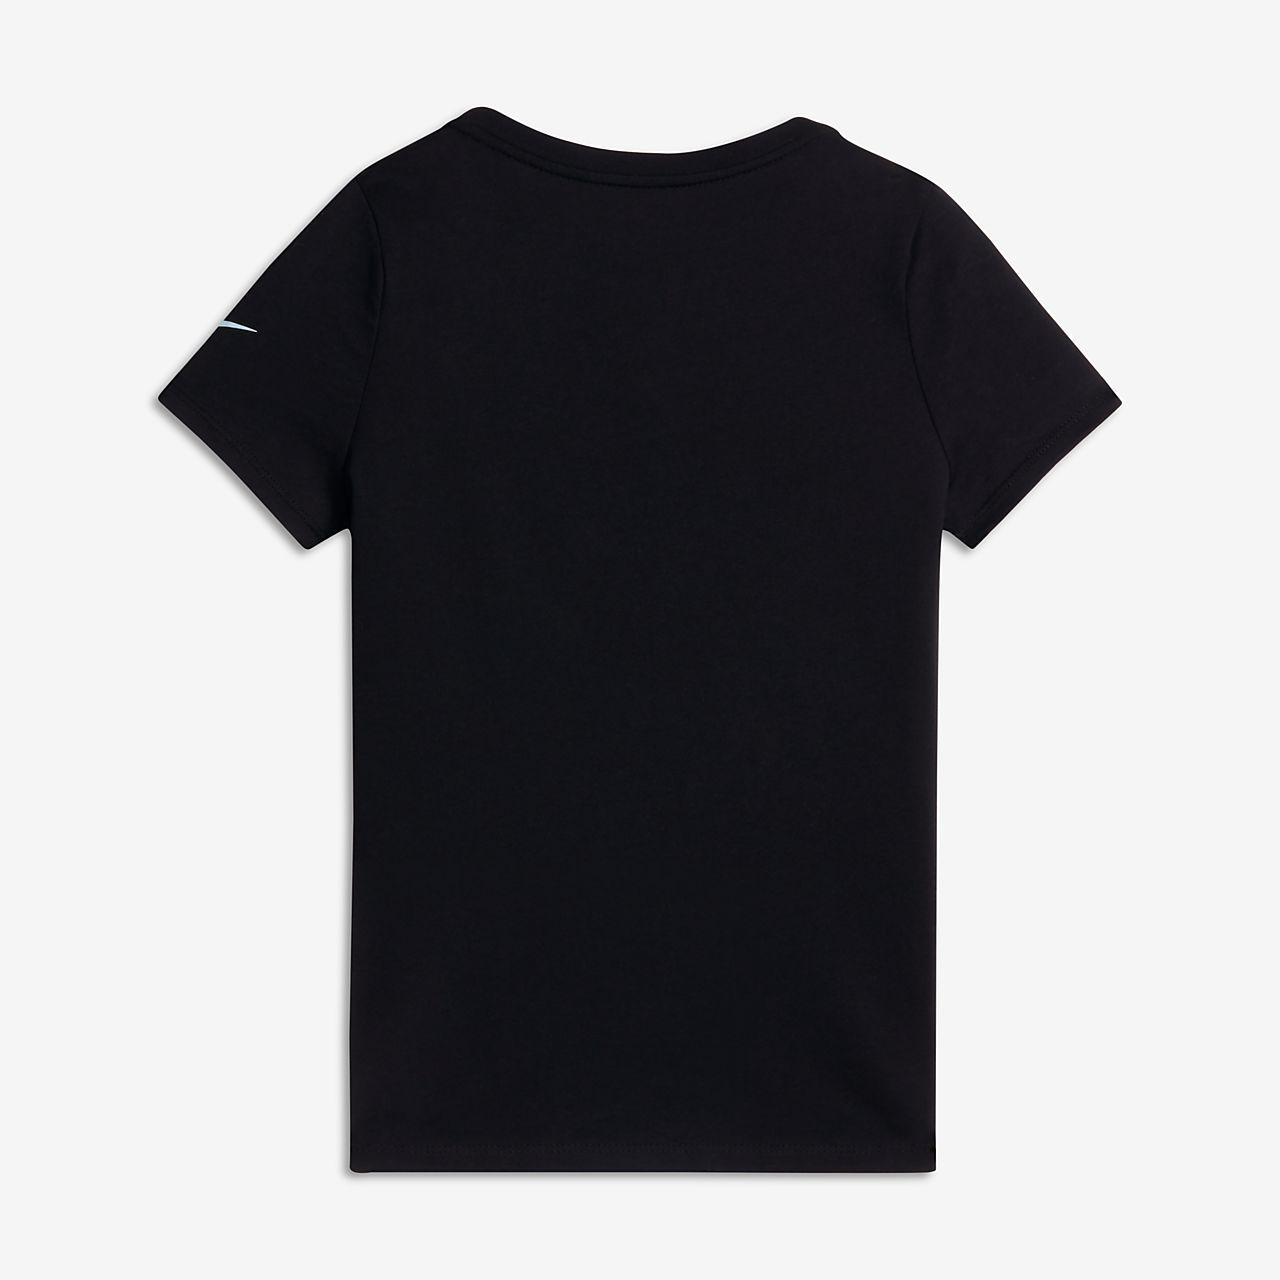 nike sportswear just do it camiseta ni241a nikecom es